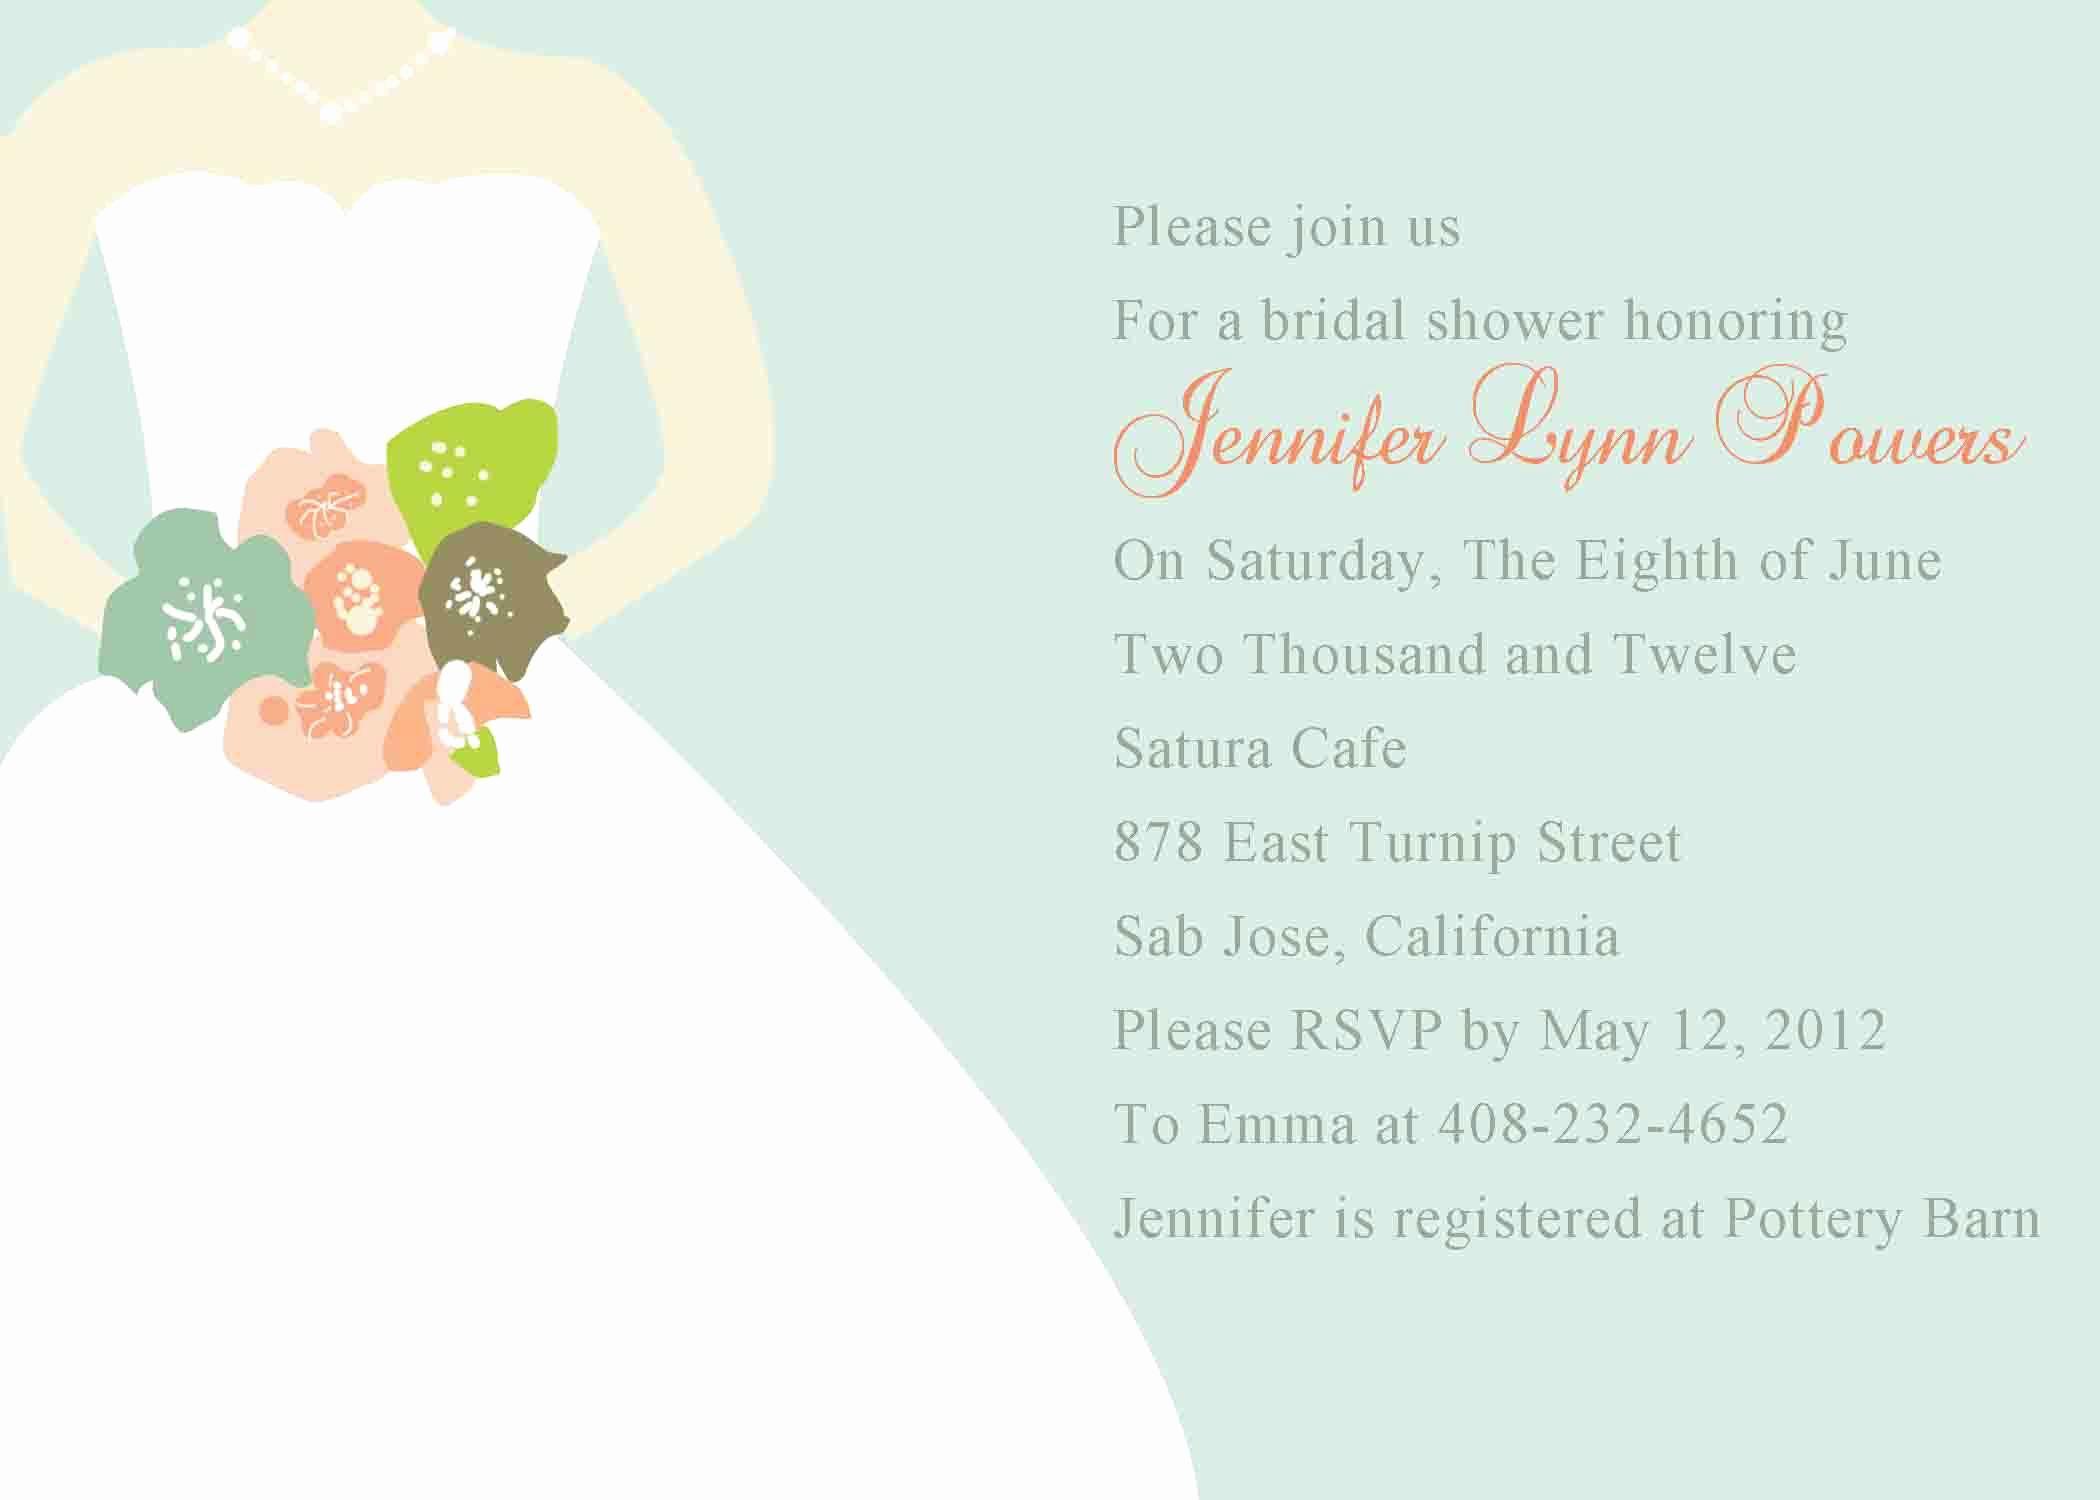 Adults Only Wedding Invitation Wording Luxury Bridal Shower Invitation Wording Adults Only